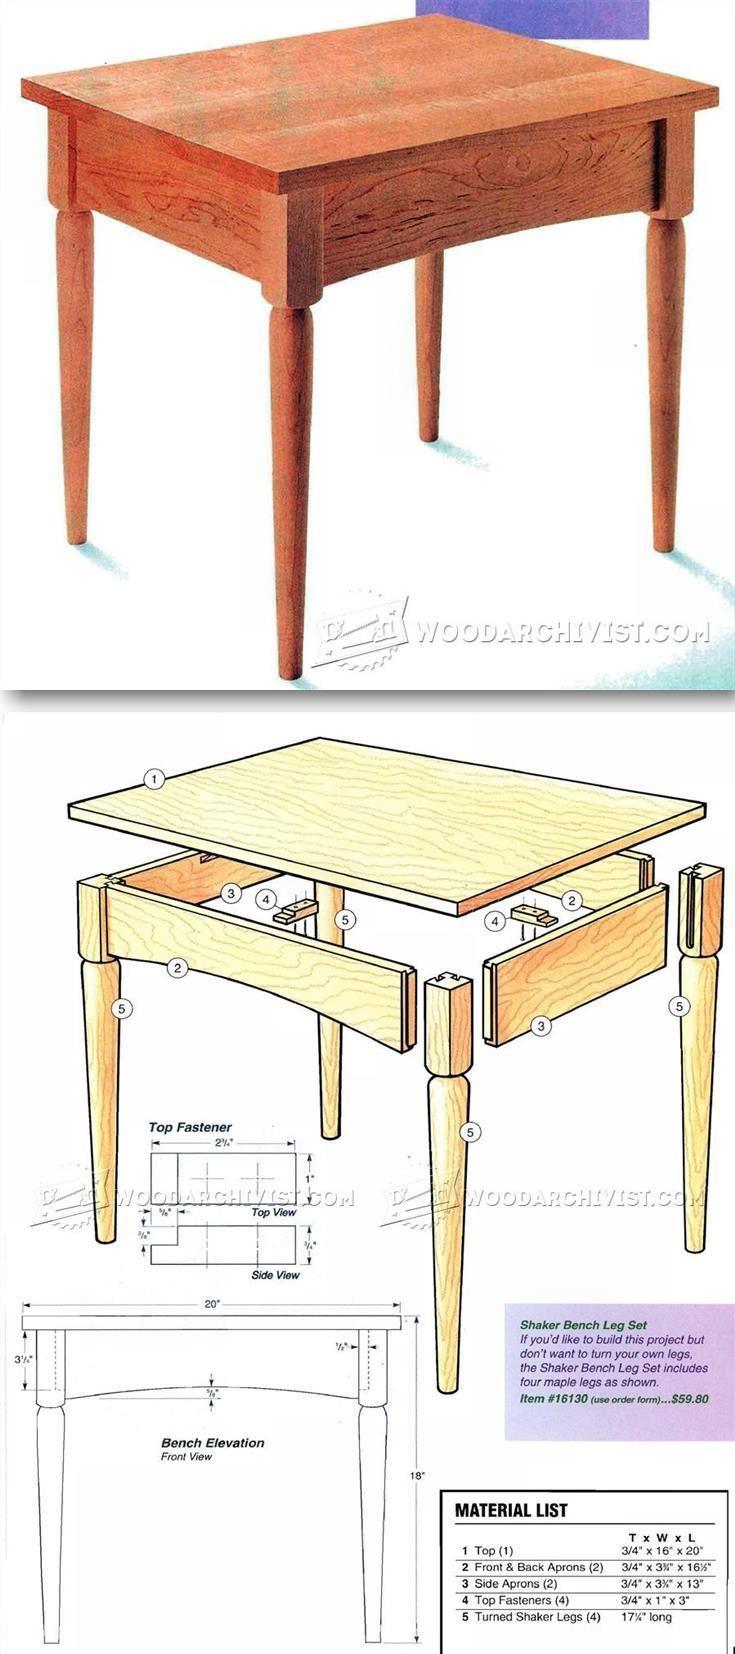 Shaker bedroom furniture plans - Shaker Bench Plans Furniture Plans And Projects Woodarchivist Com